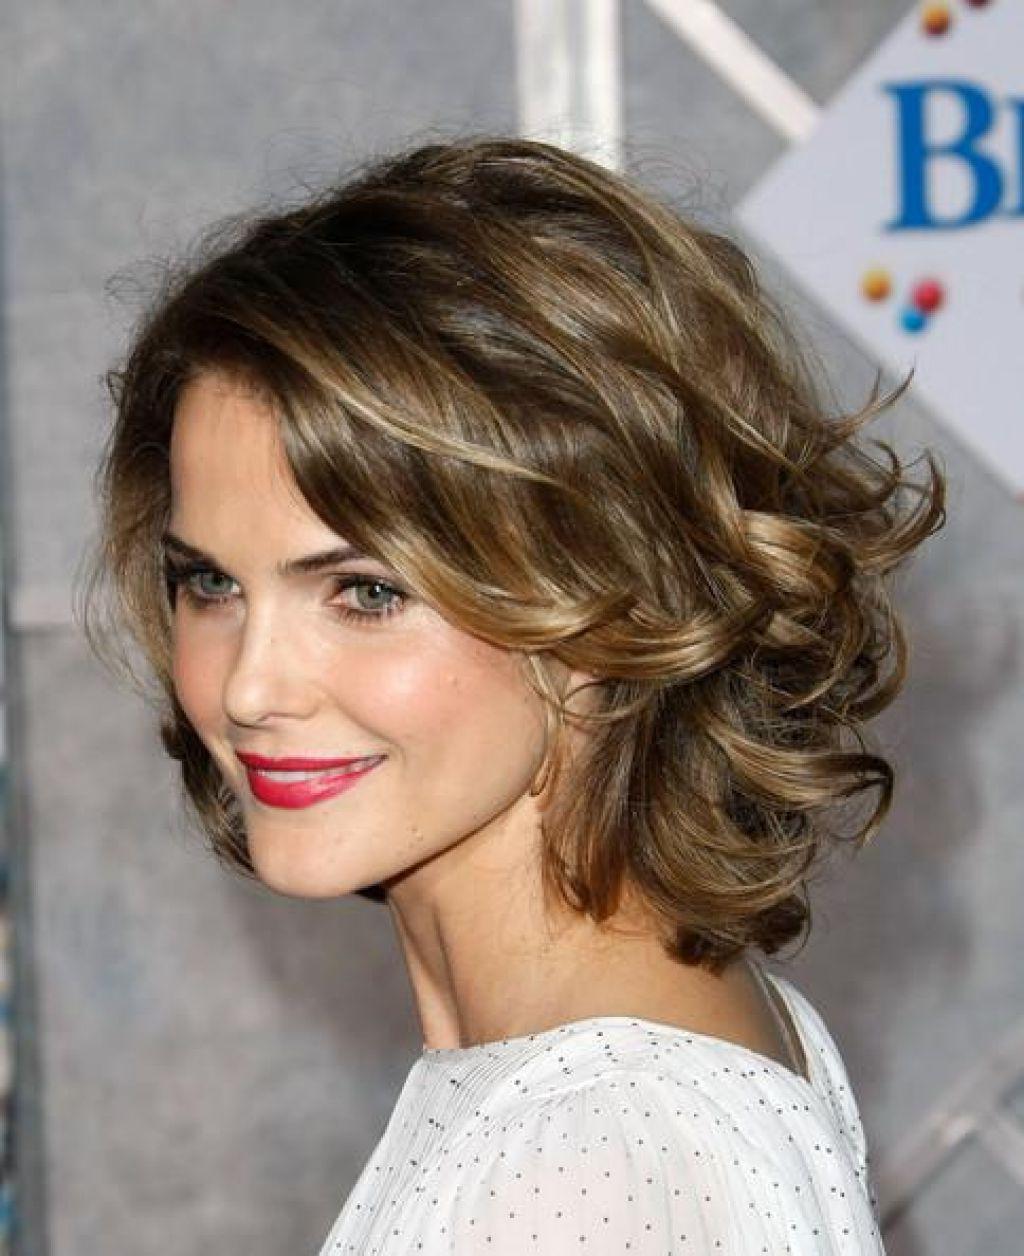 19 Short To Medium Cuts For Curly And Wavy Hair 2018 | Hairstyle Guru Regarding Women Short To Medium Hairstyles (View 24 of 25)